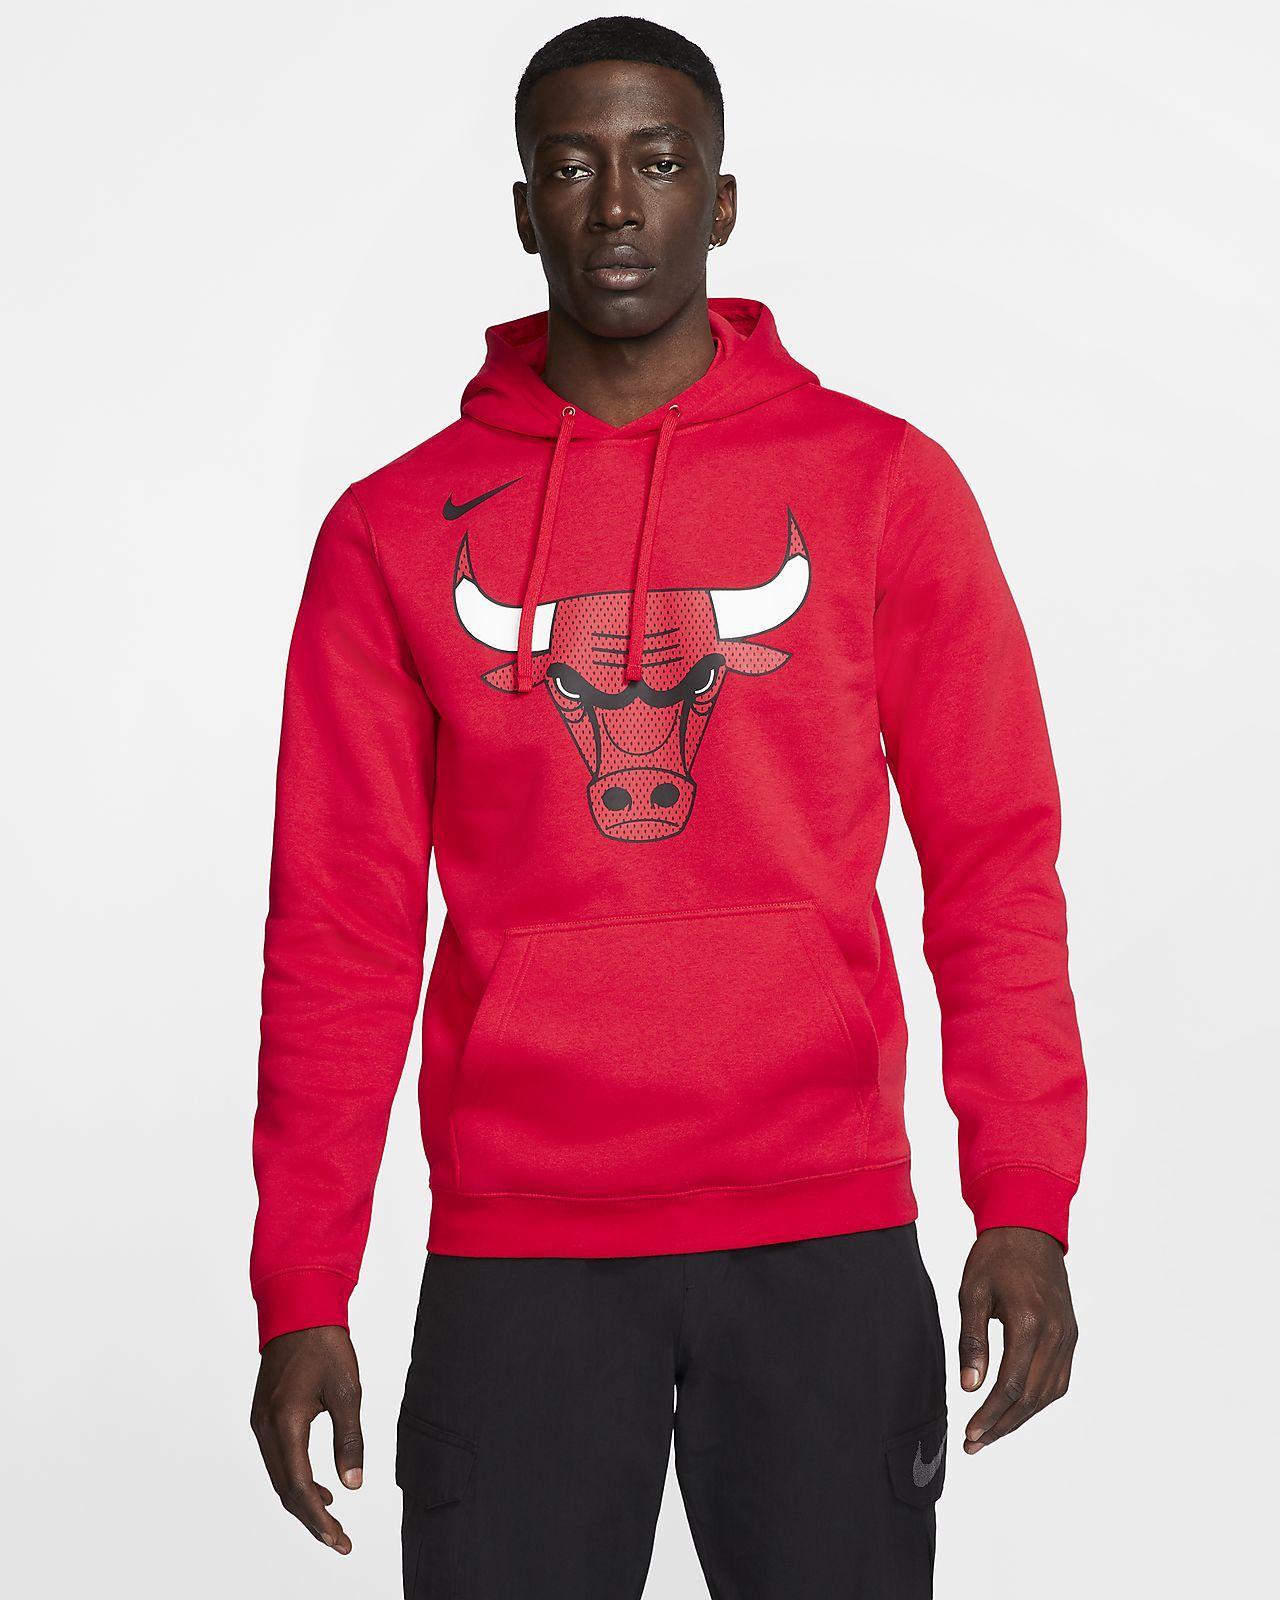 Capucha Chicago Nba Sudadera Con De Bulls La Nike Hombre PwkZOuXiT